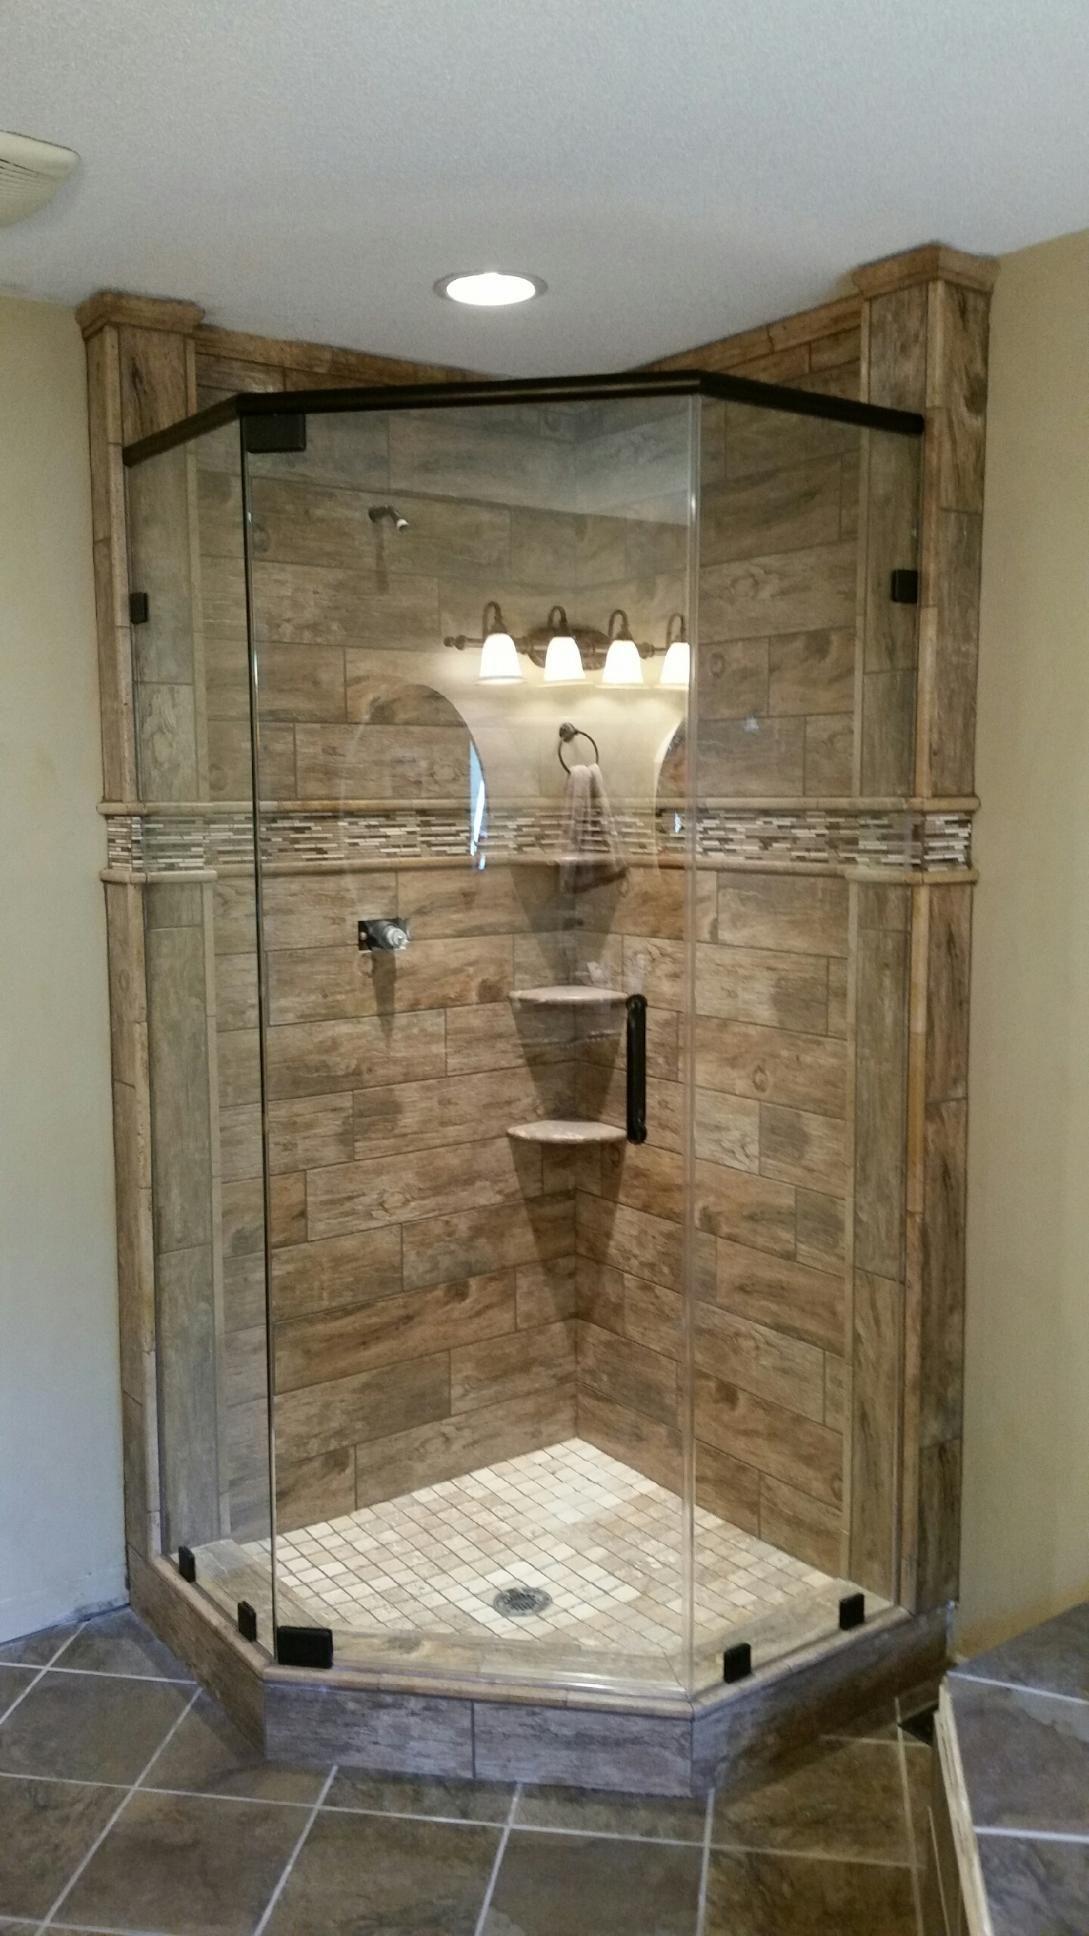 Captivating Frameless Shower Door For Modern Bathroom Decoration